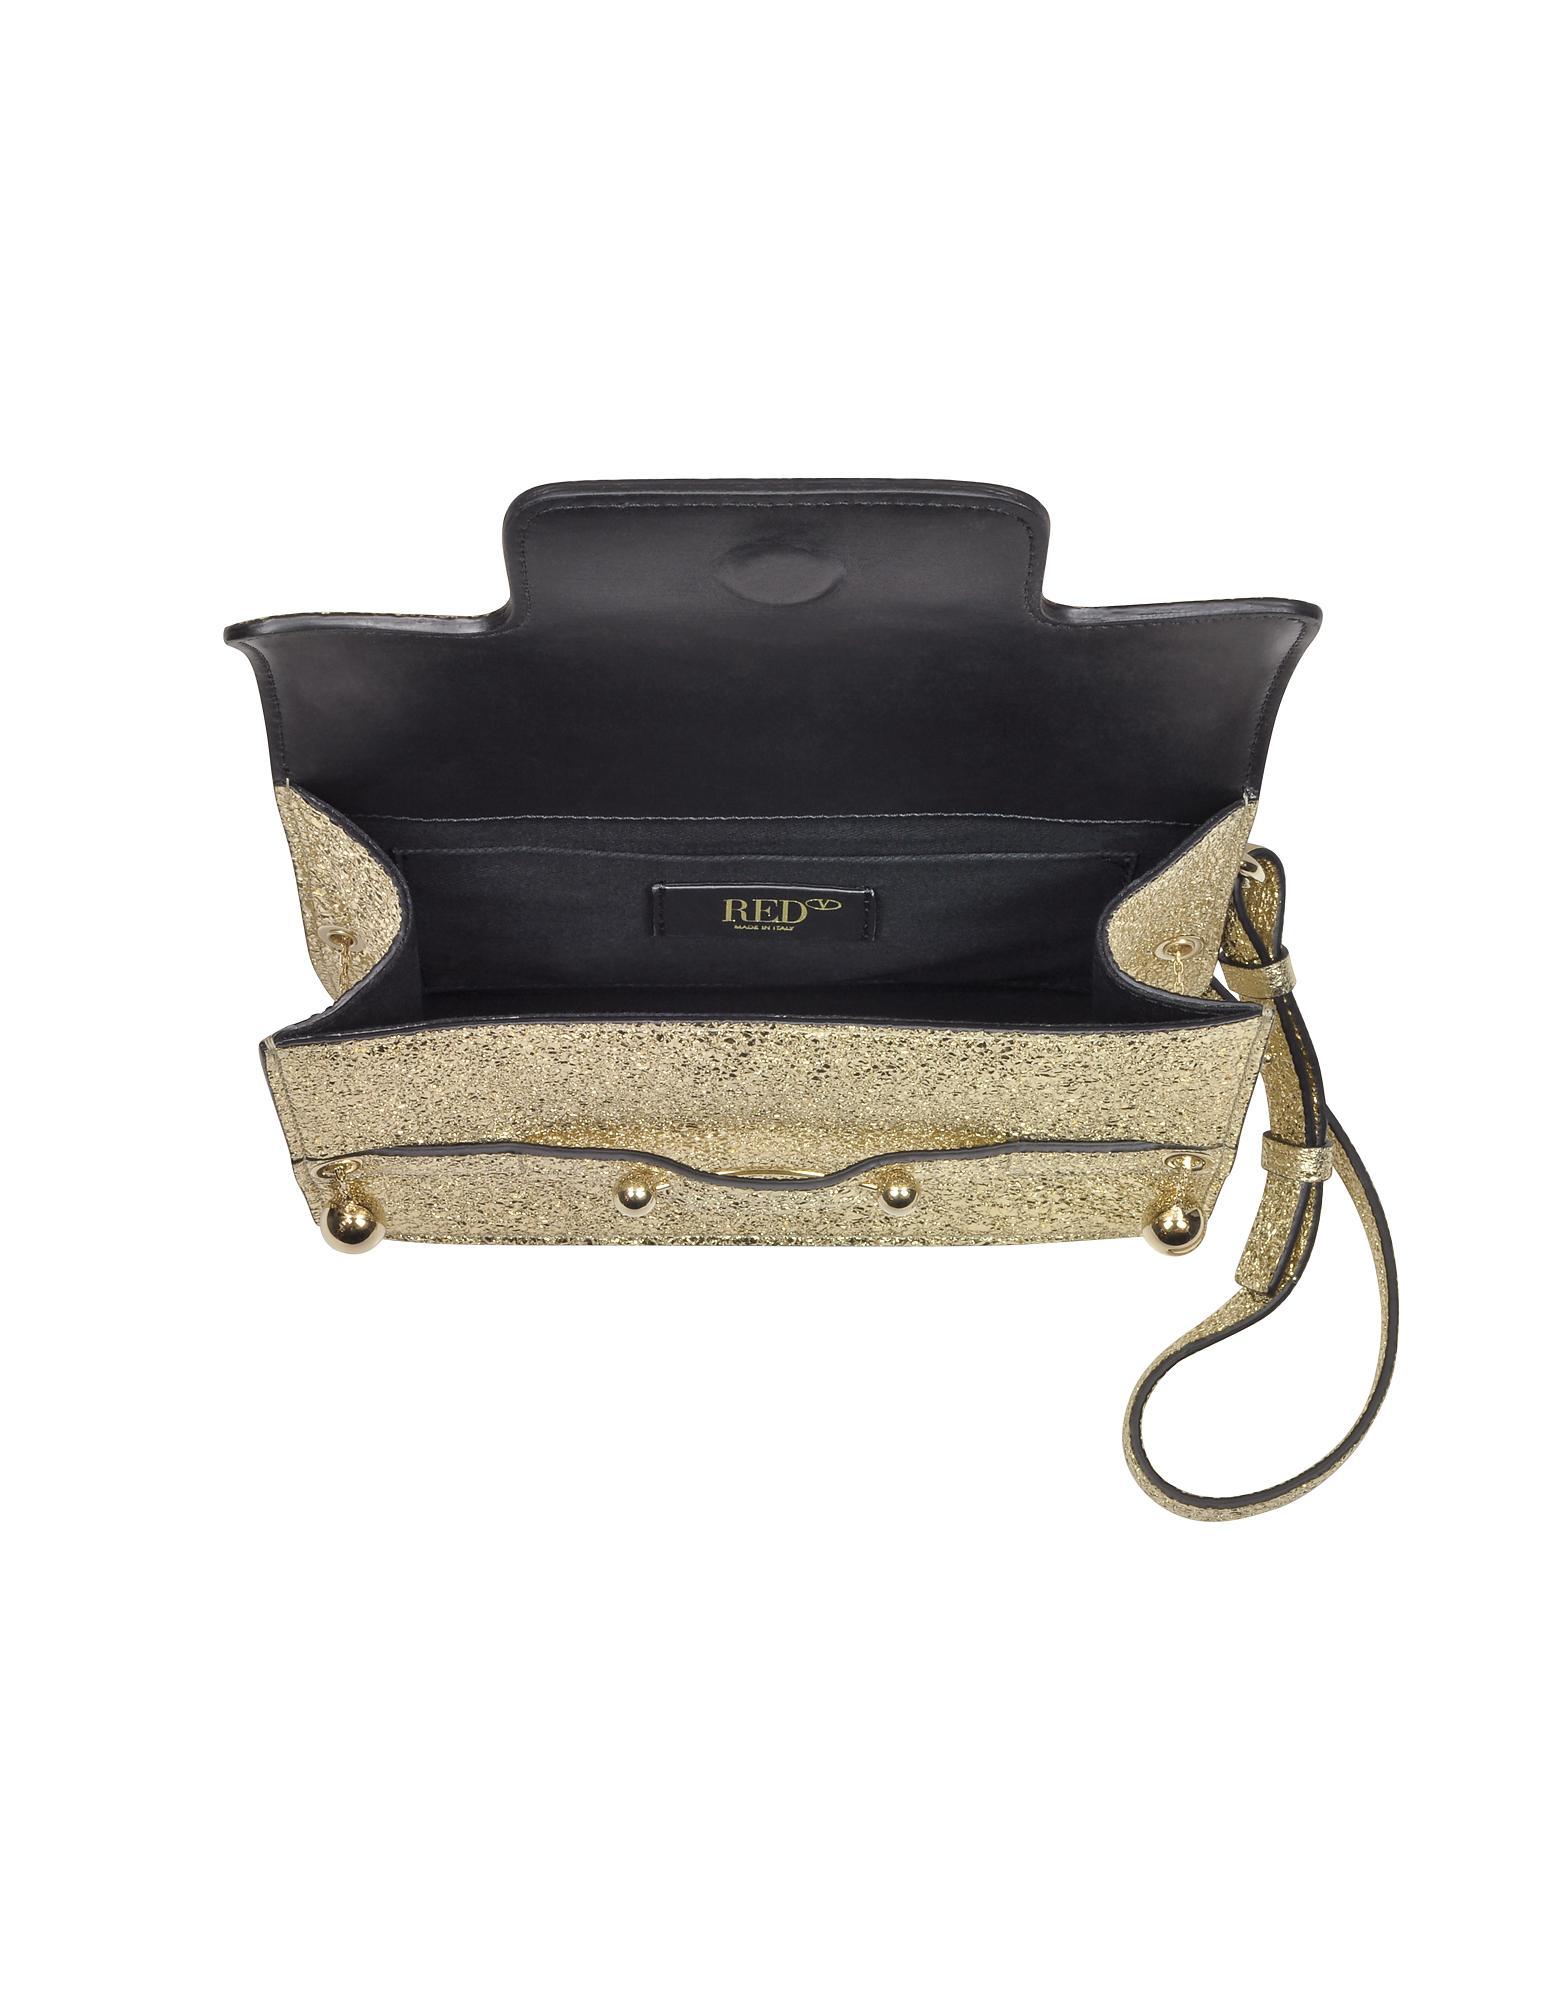 RED Valentino - Platinum Crackled Metallic Leather Flap Top Crossbody Bag -  Lyst. View fullscreen ad7cb5e48692e